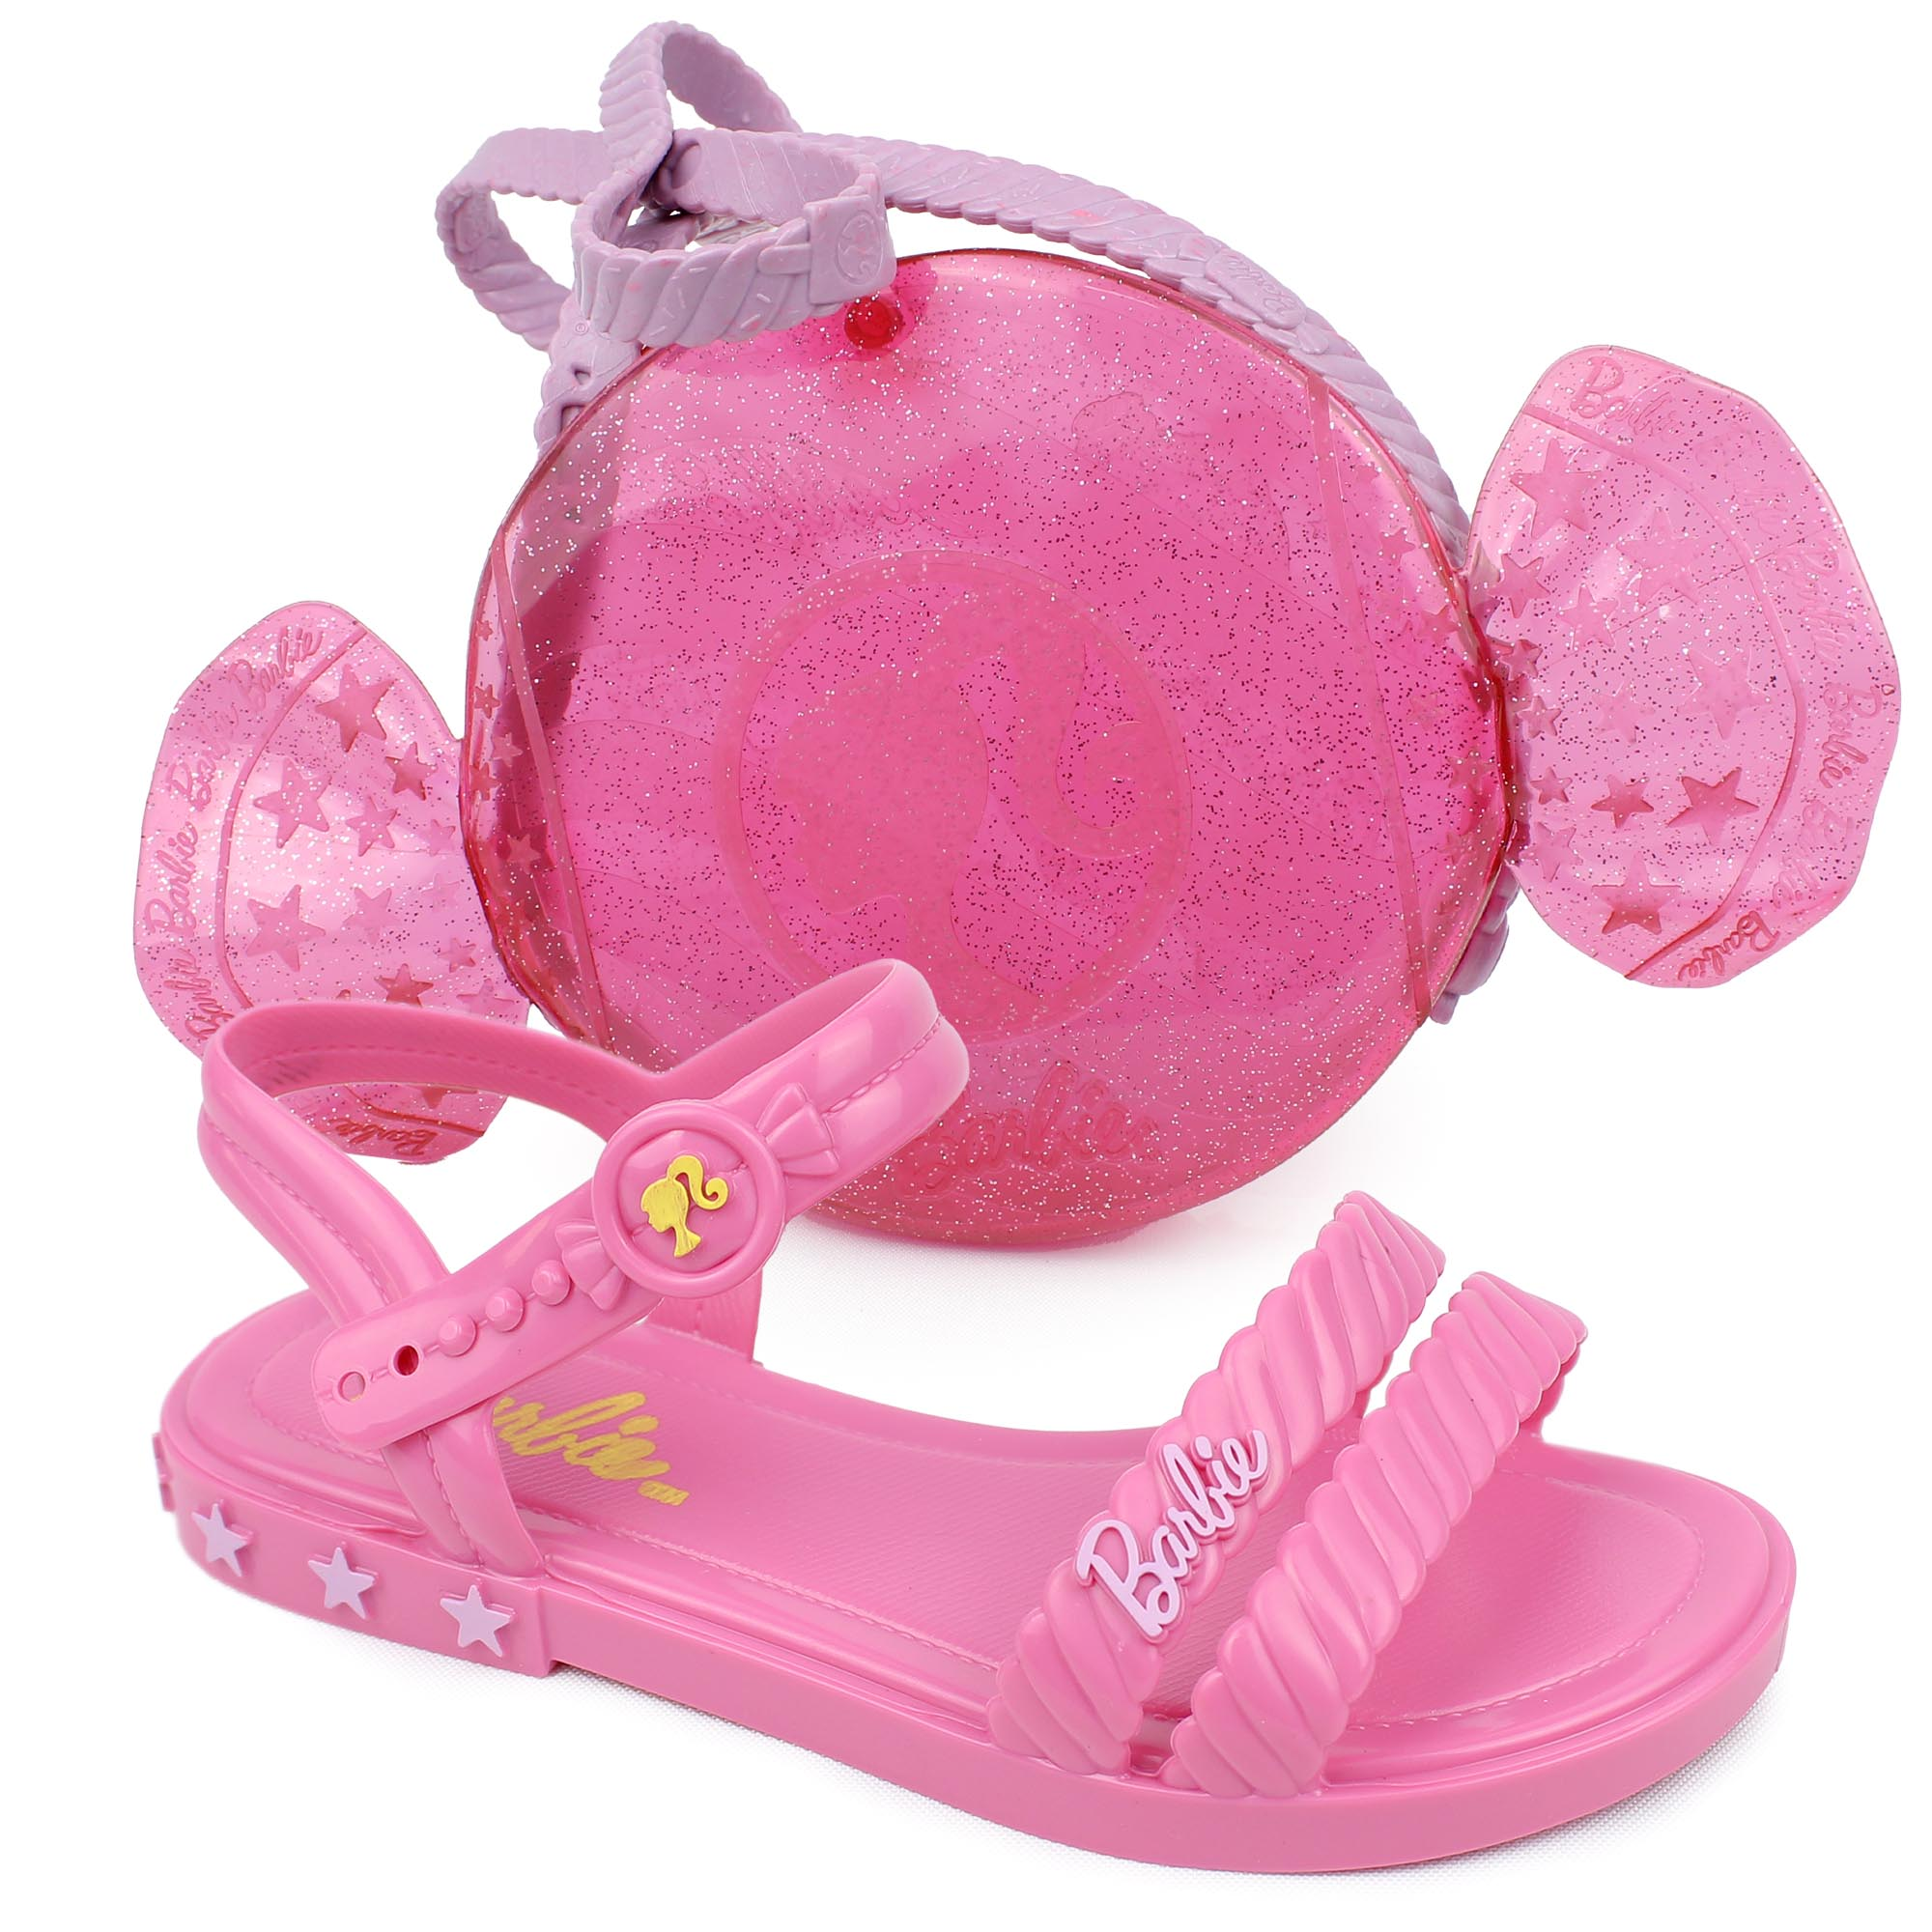 Sandália Infantil Grendene Kids Barbie Candy + Bolsa